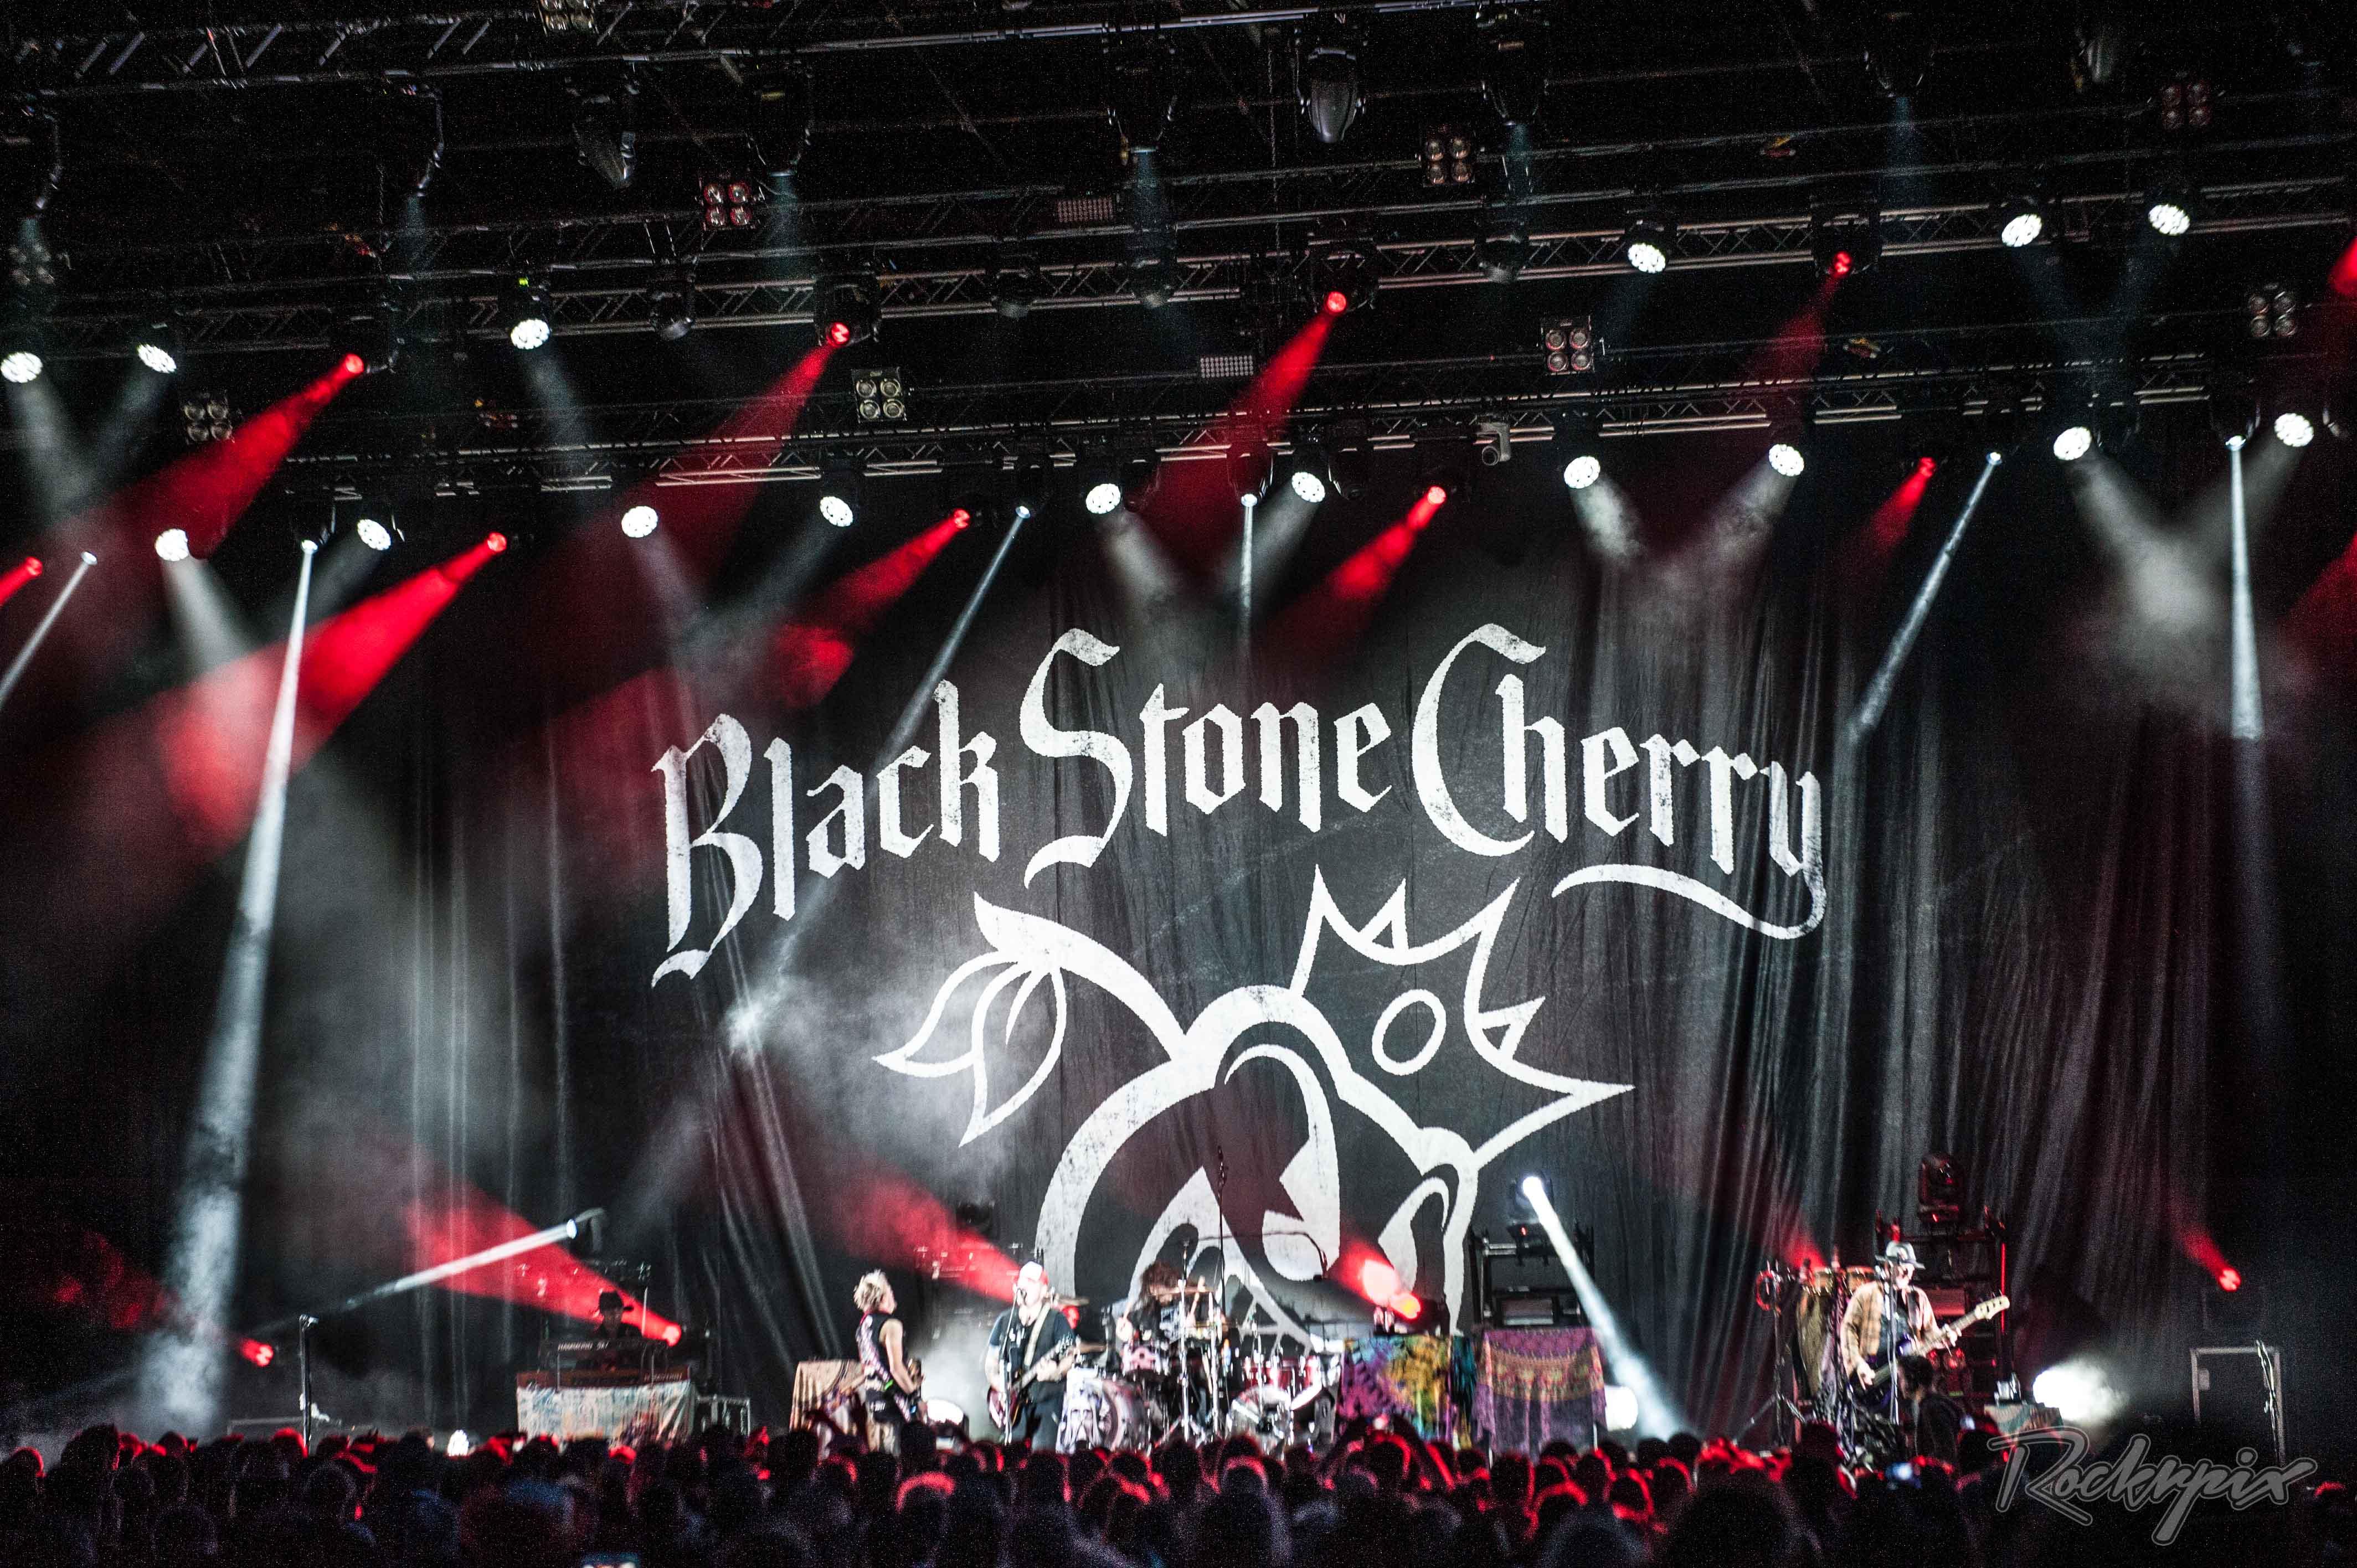 BlackStoneCherry-7821.jpg